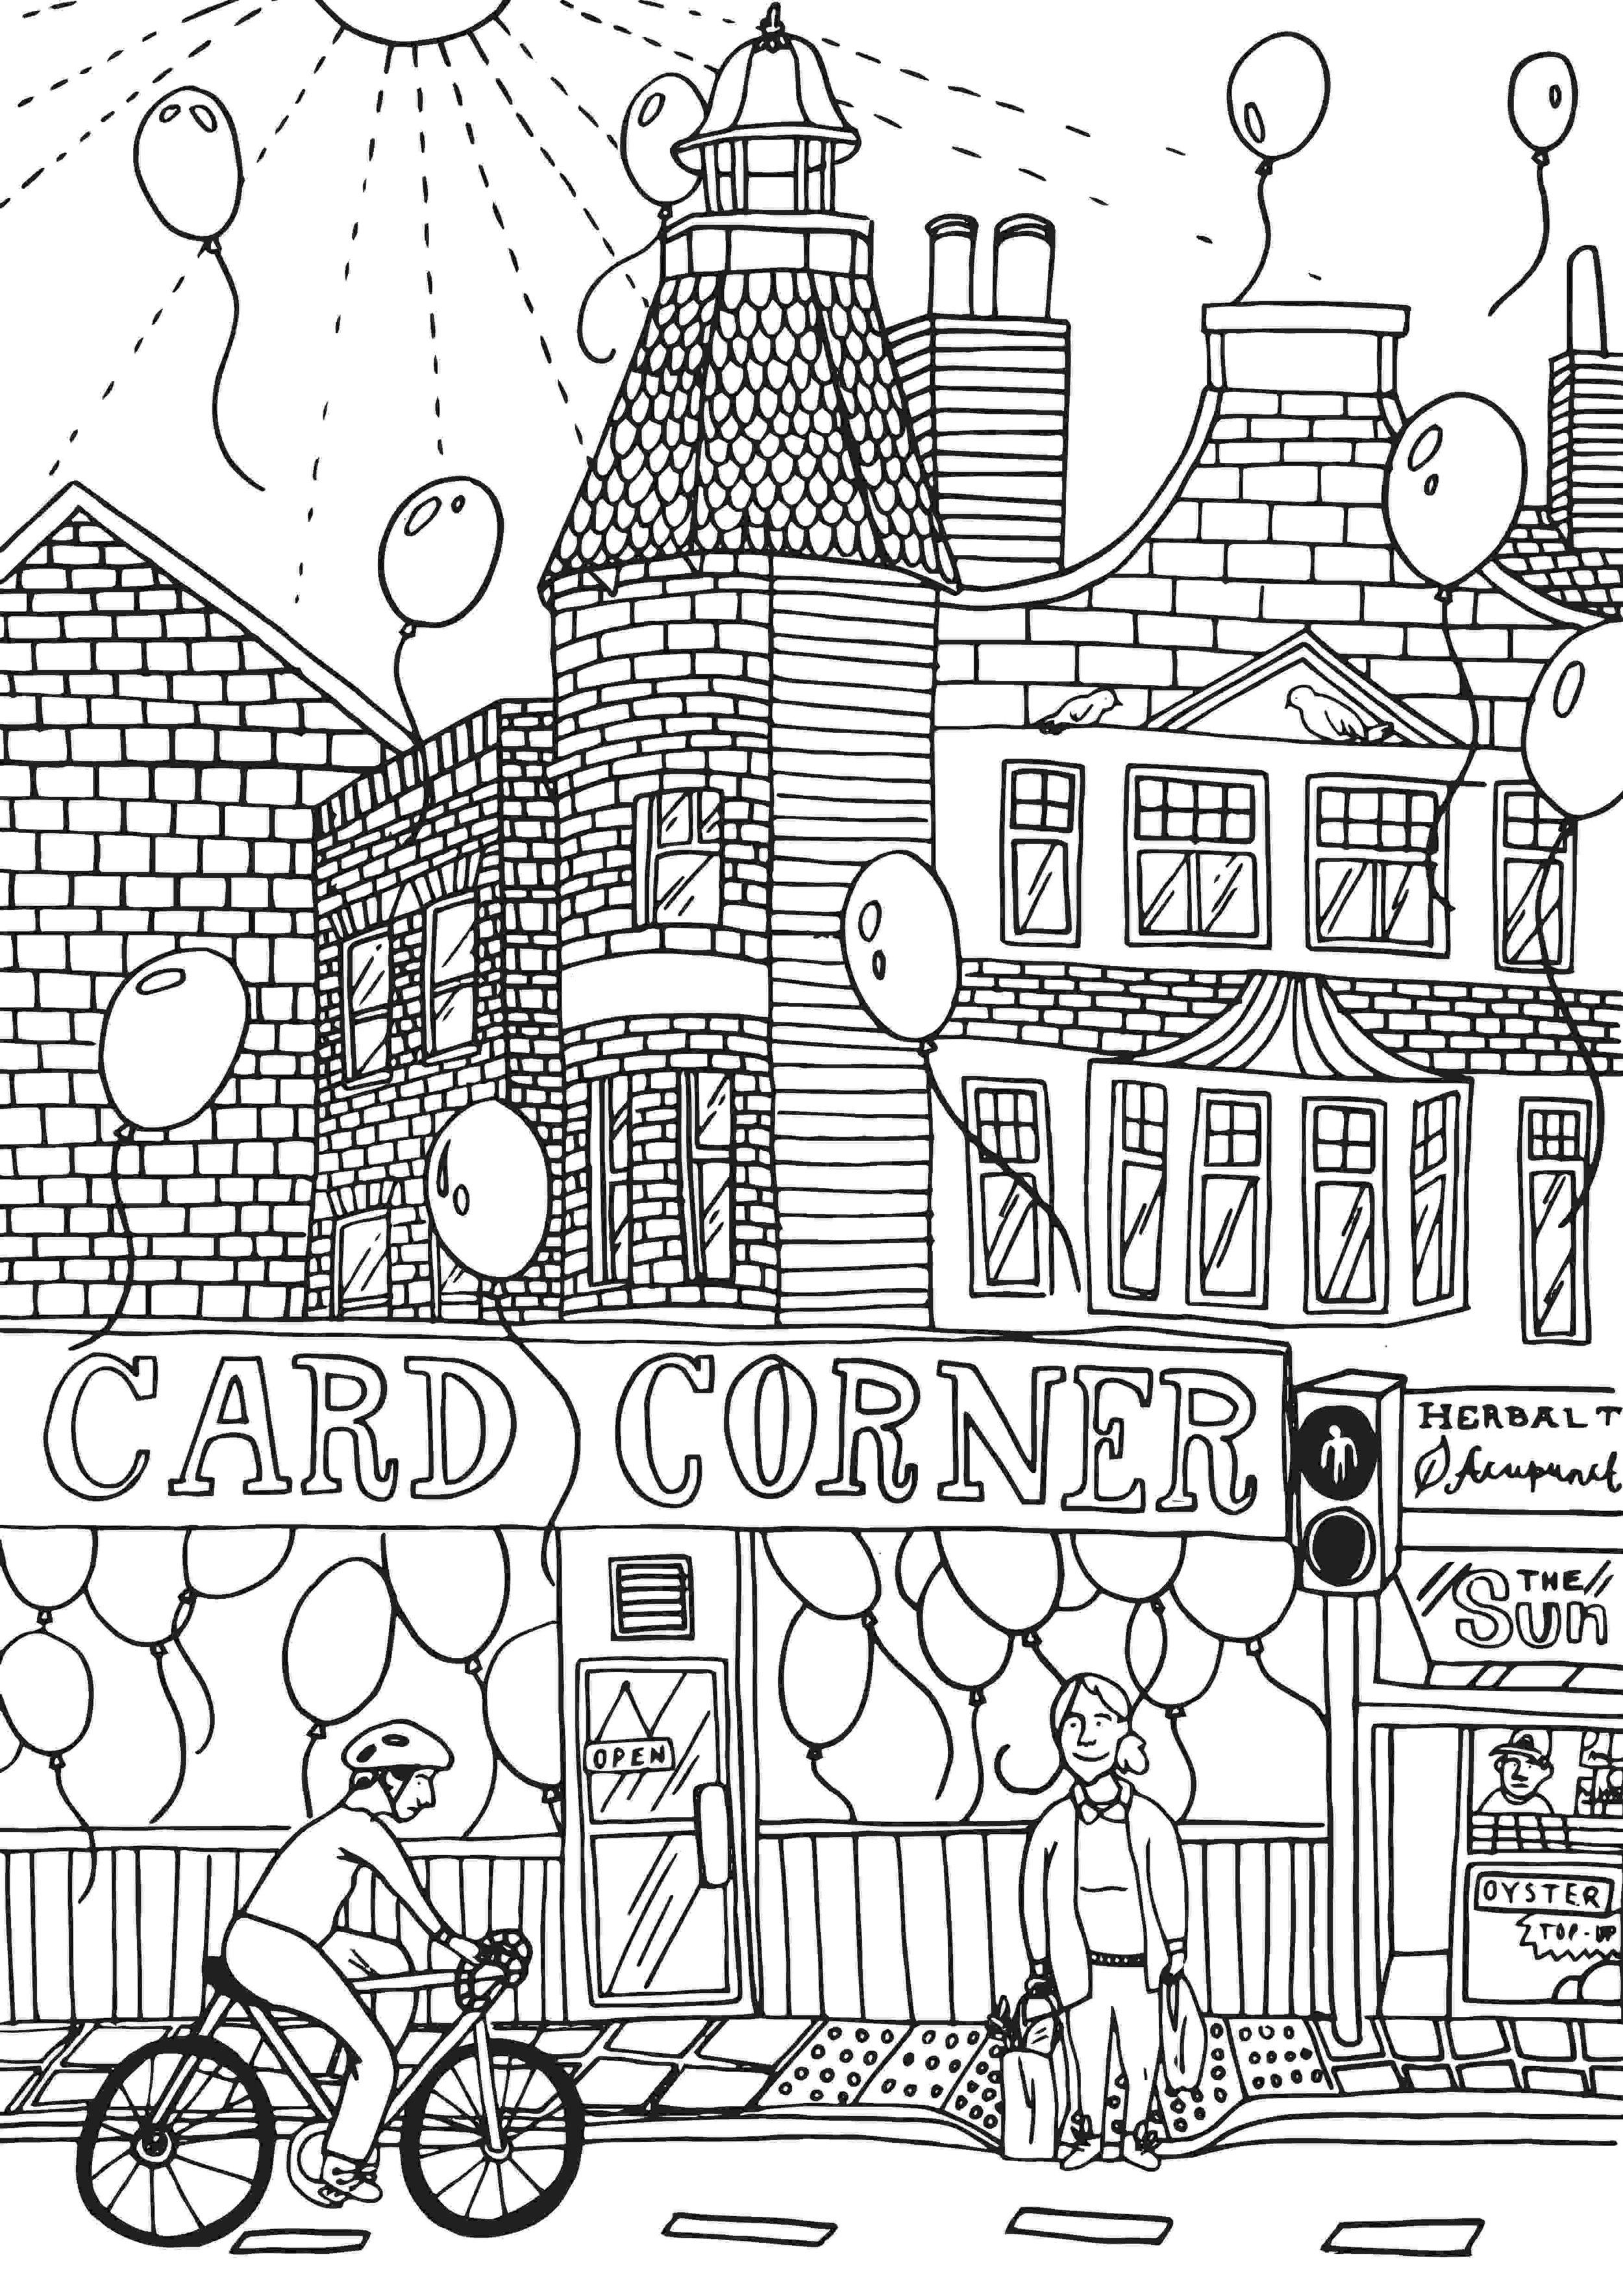 Card Corner low res.jpg